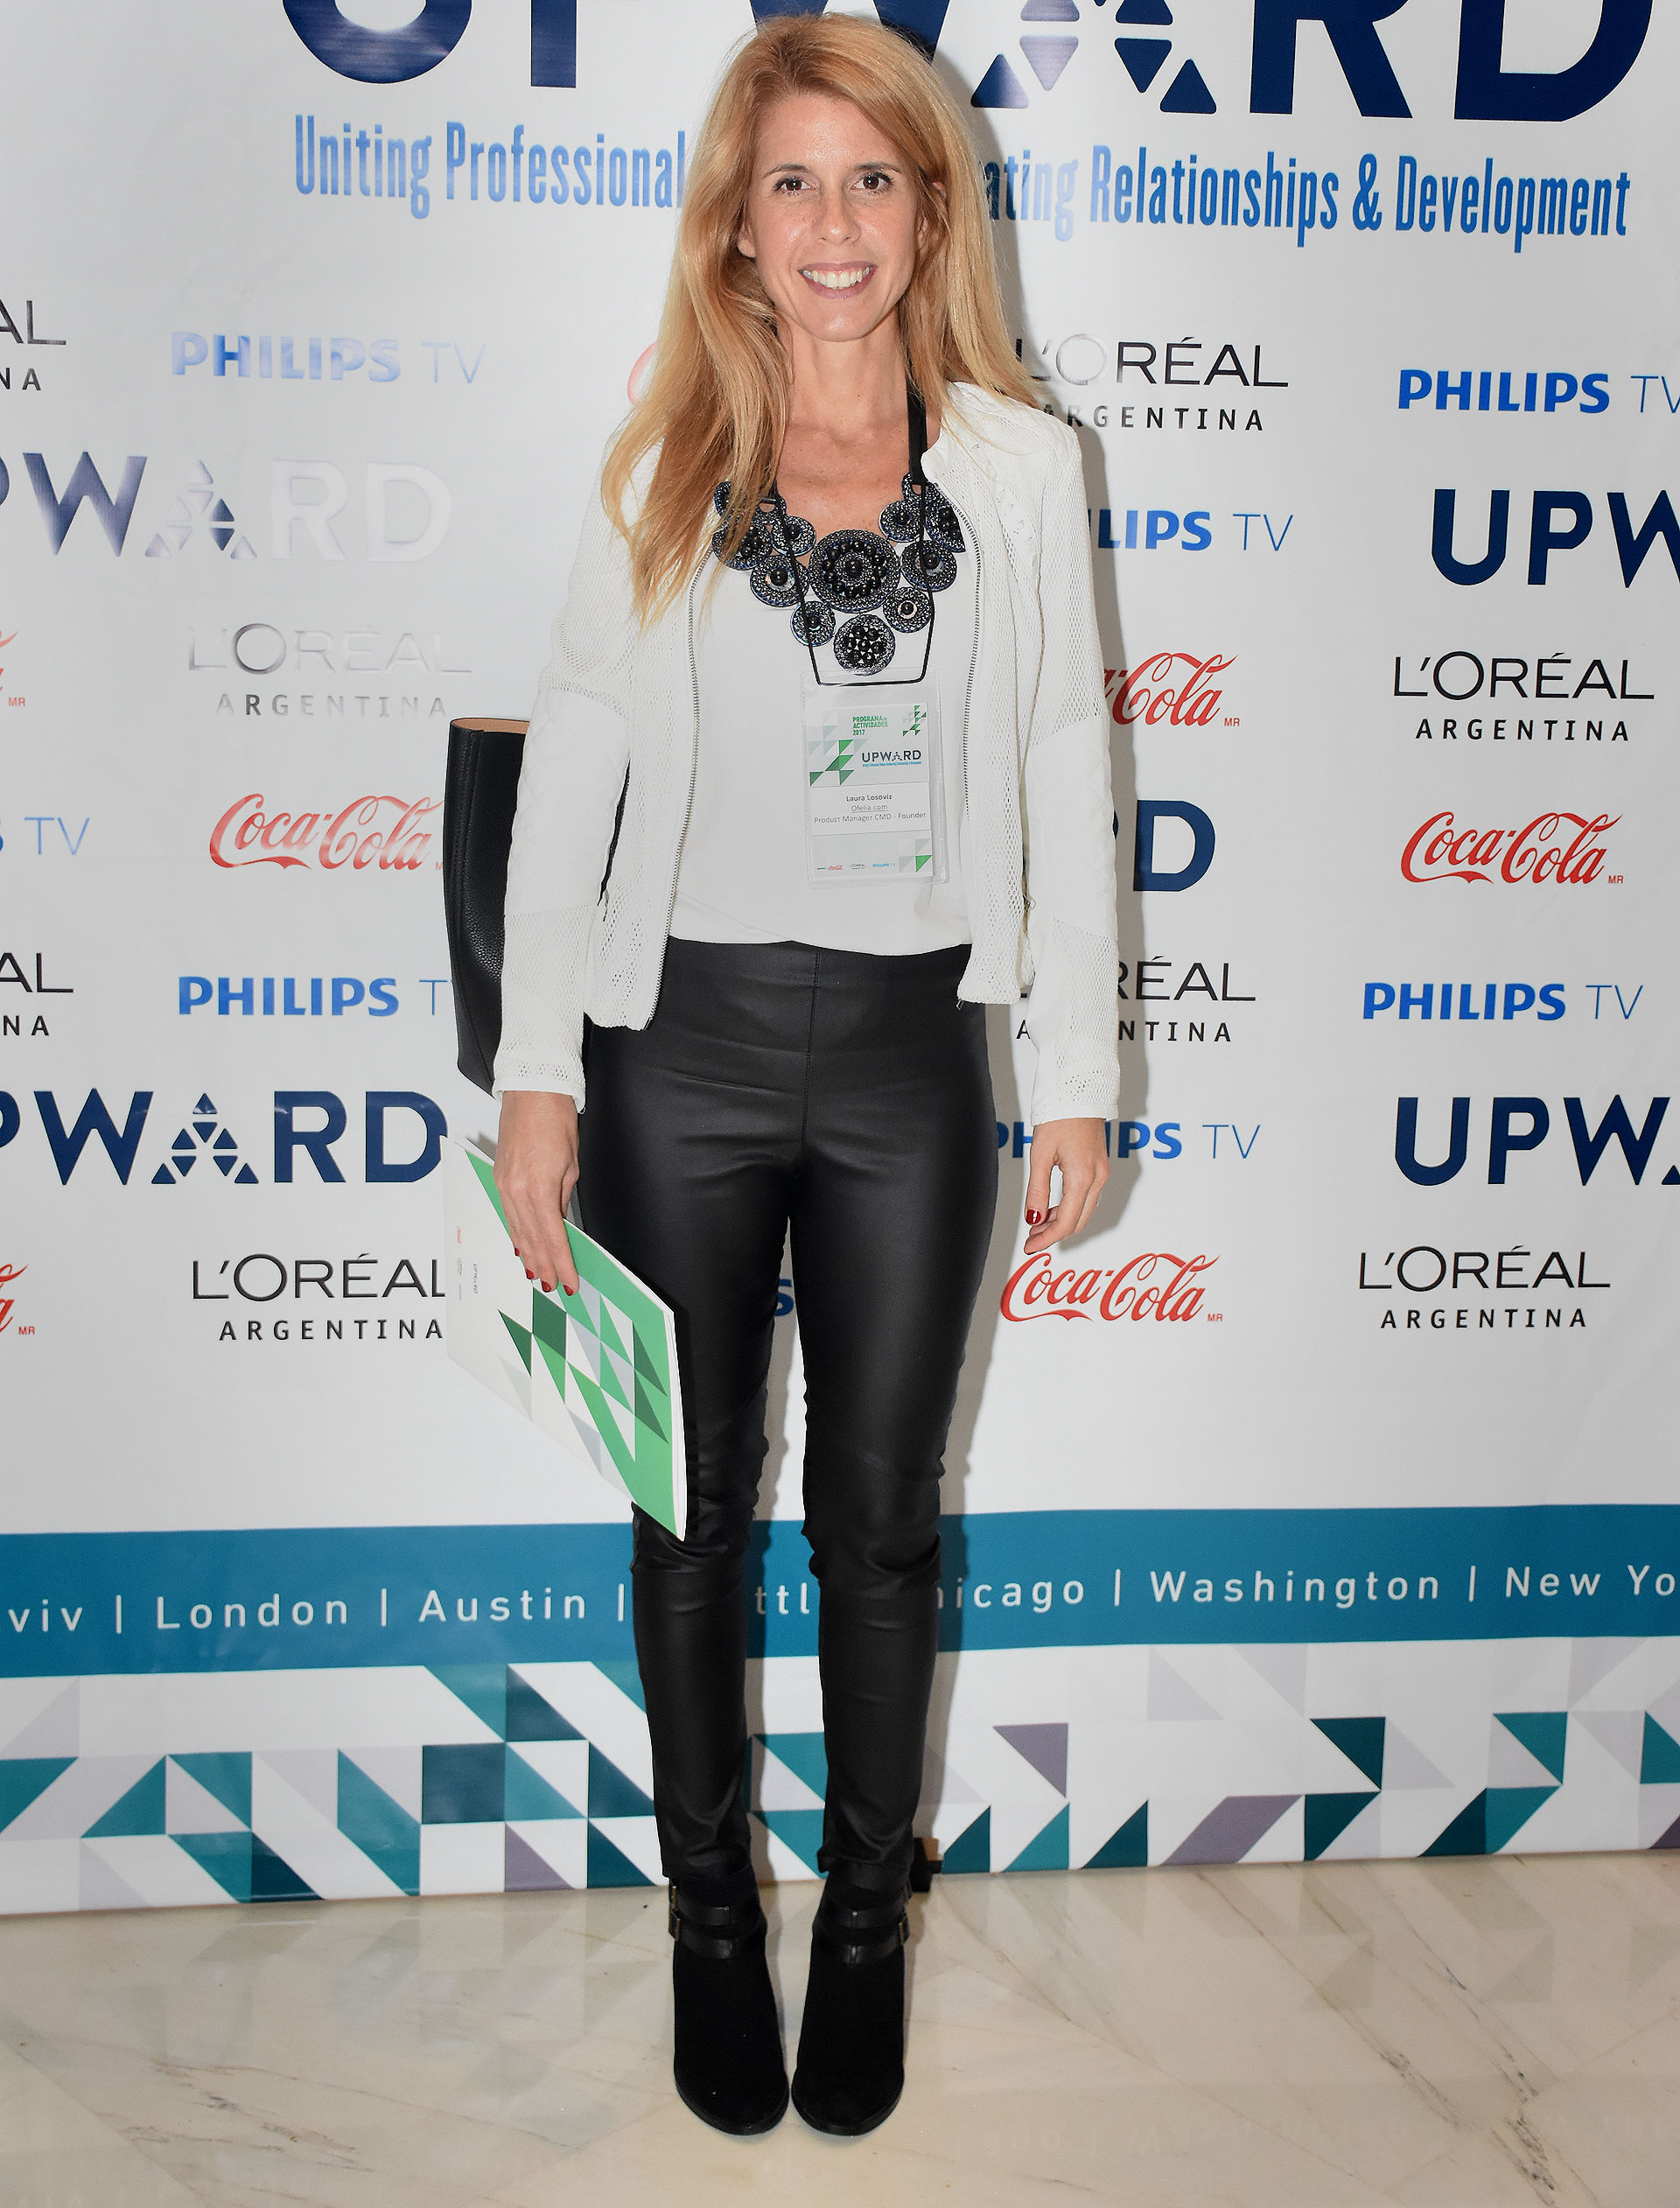 Laura Losoviz (Ofelia.com)